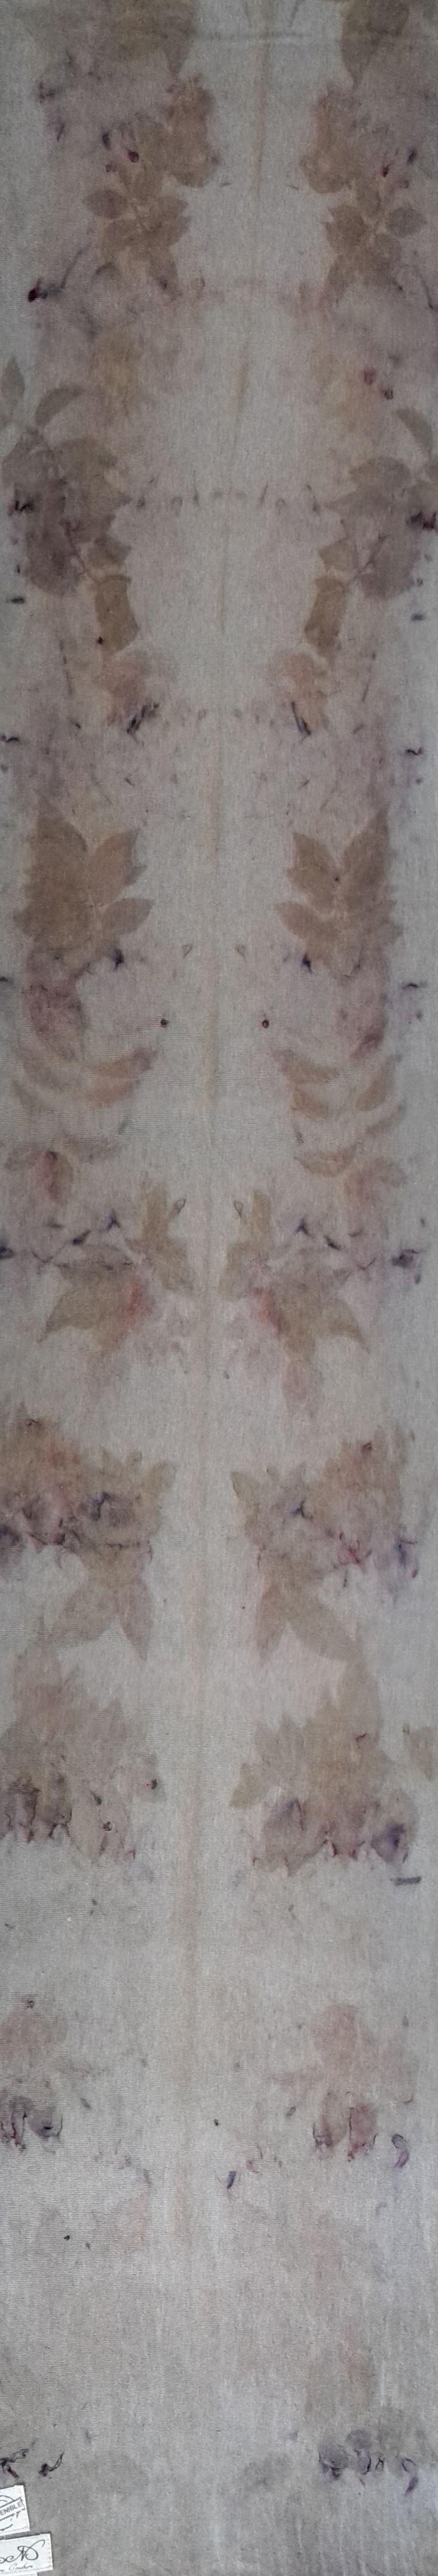 Ecoprint by Nanou Couture . Moda organica y tintes naturales. Organic fashion and natural dyes. ecodye Etikology Ibiza